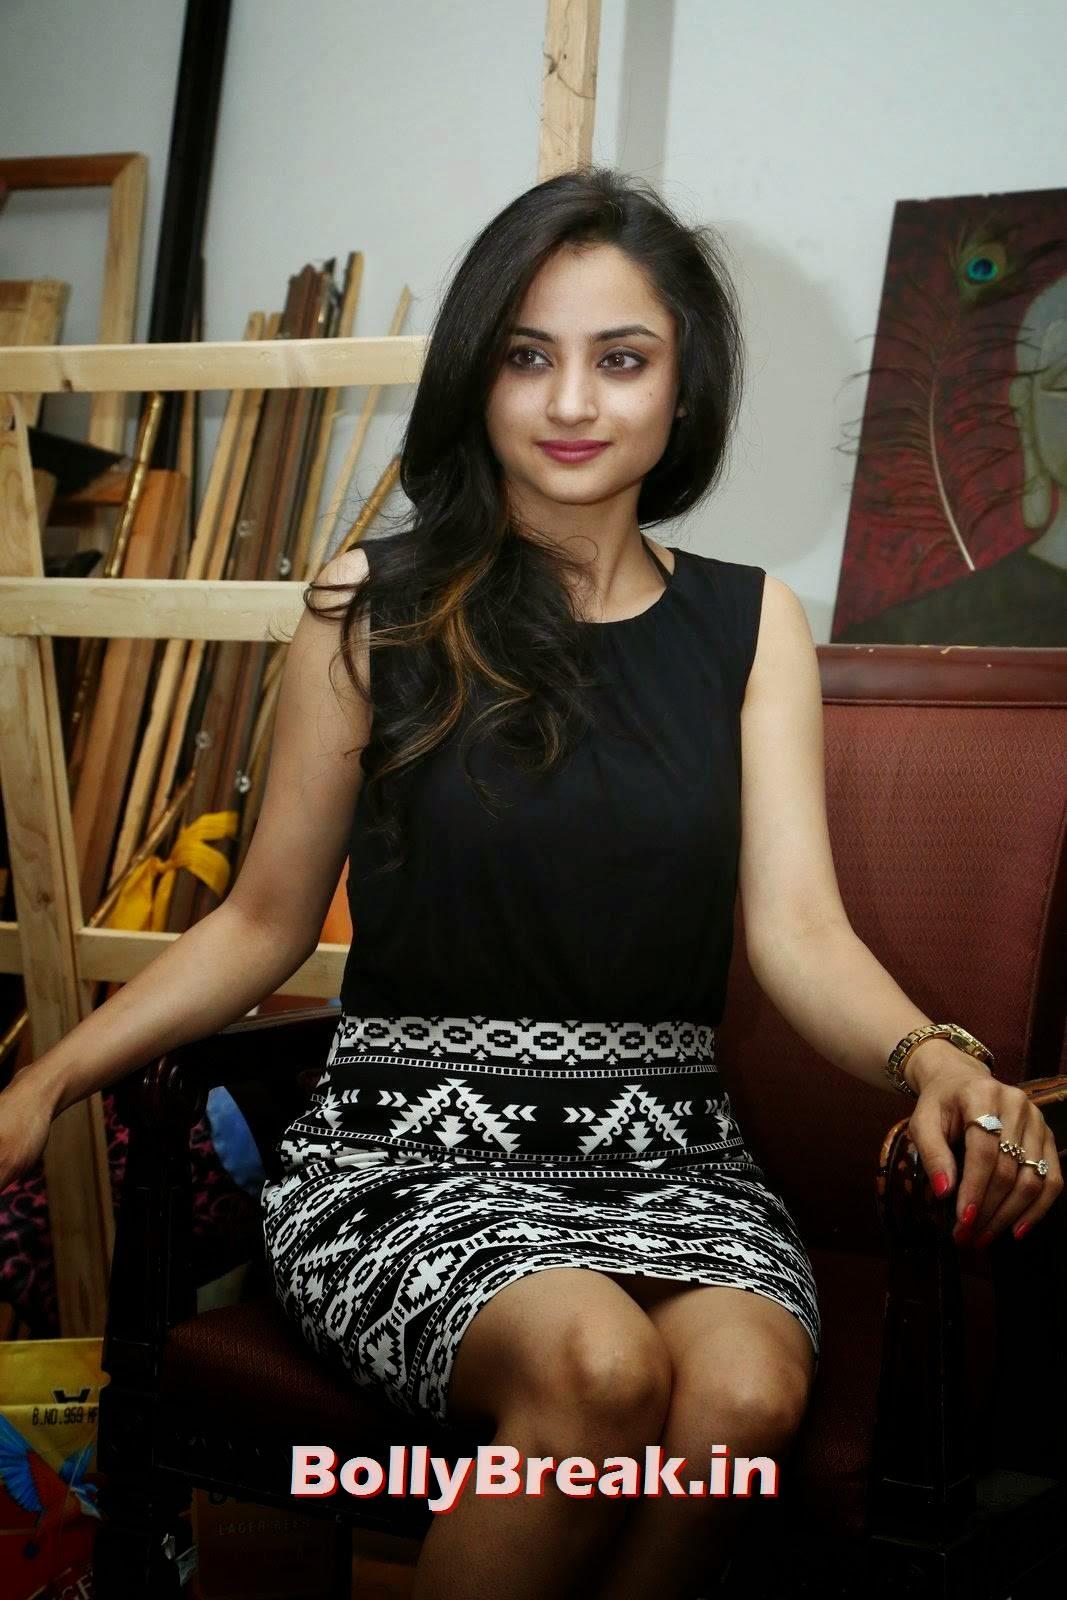 Actress Madirakshi Pictures, Actress Madirakshi Hot Pics in Skirt & Black Top